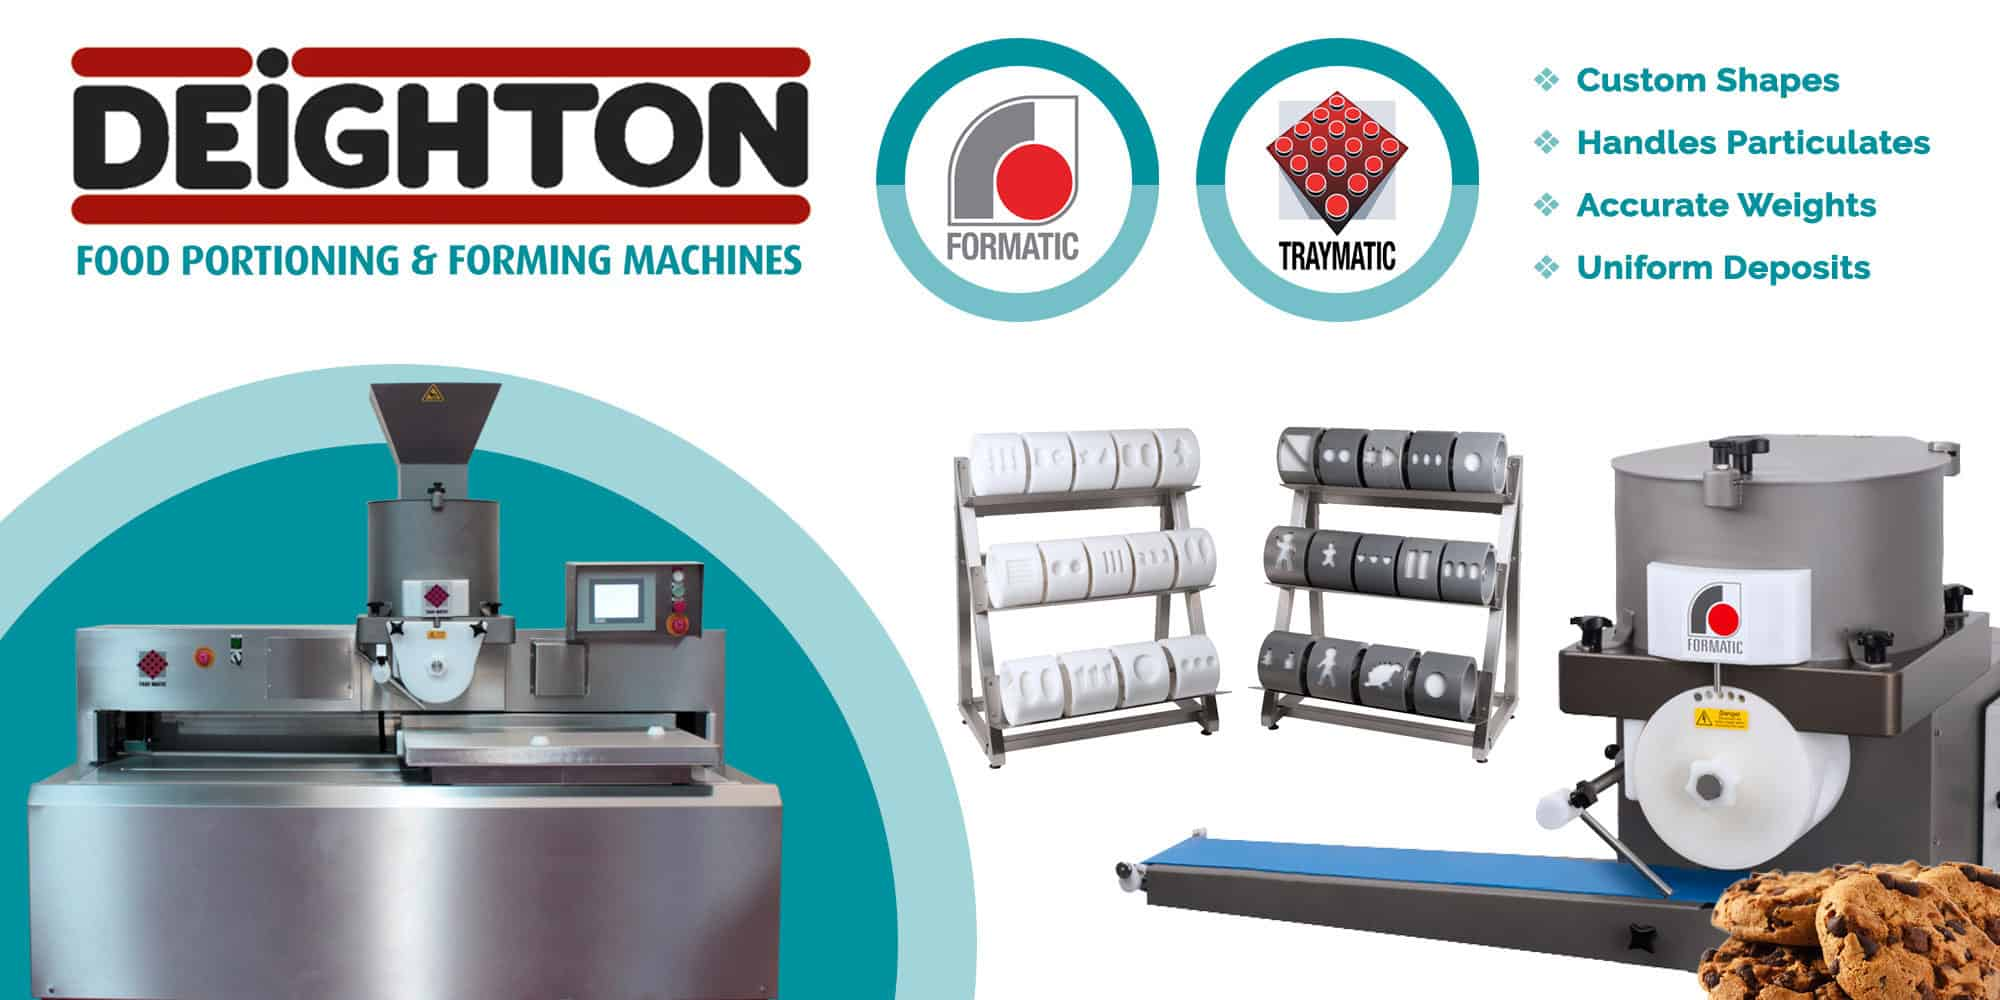 Deighton Manufacturing | Formatic | Cookie Machines